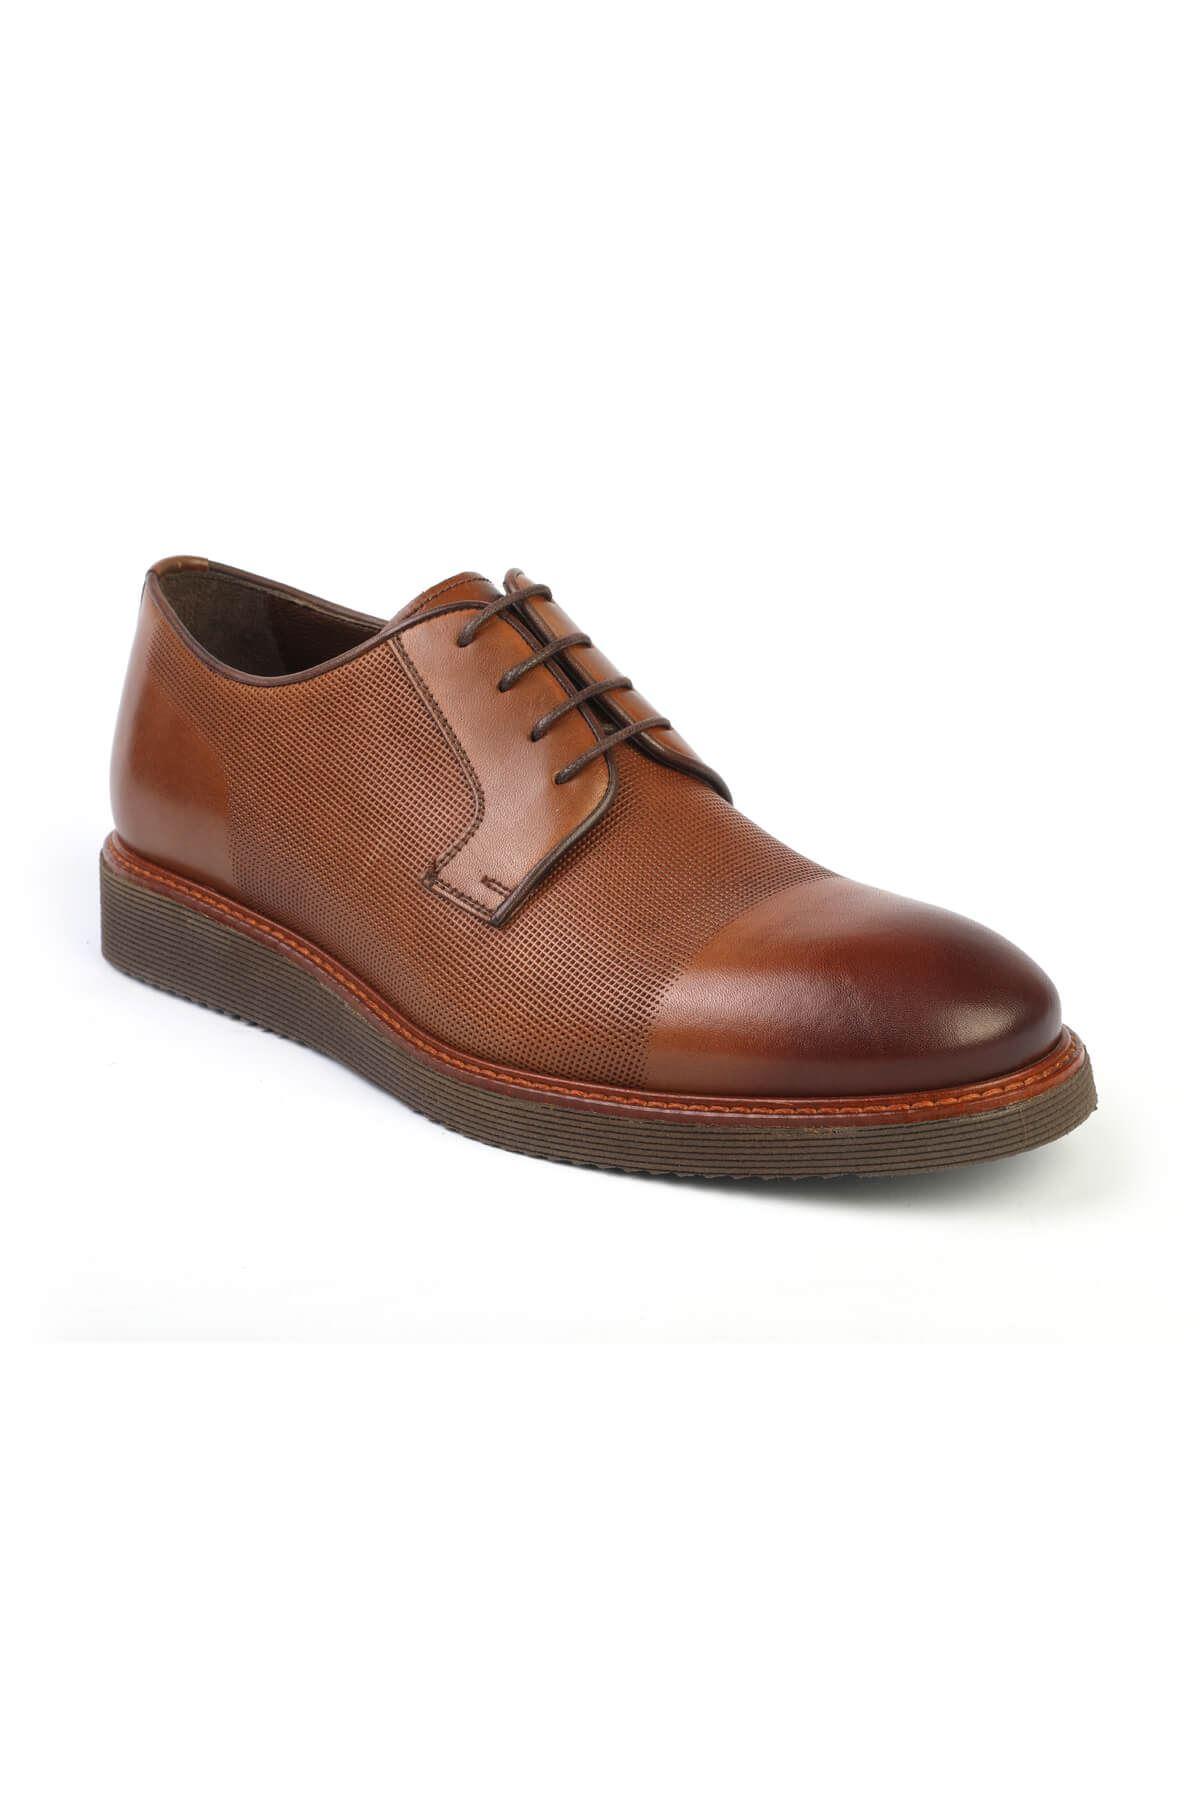 Libero C252 Tan Oxford Shoes